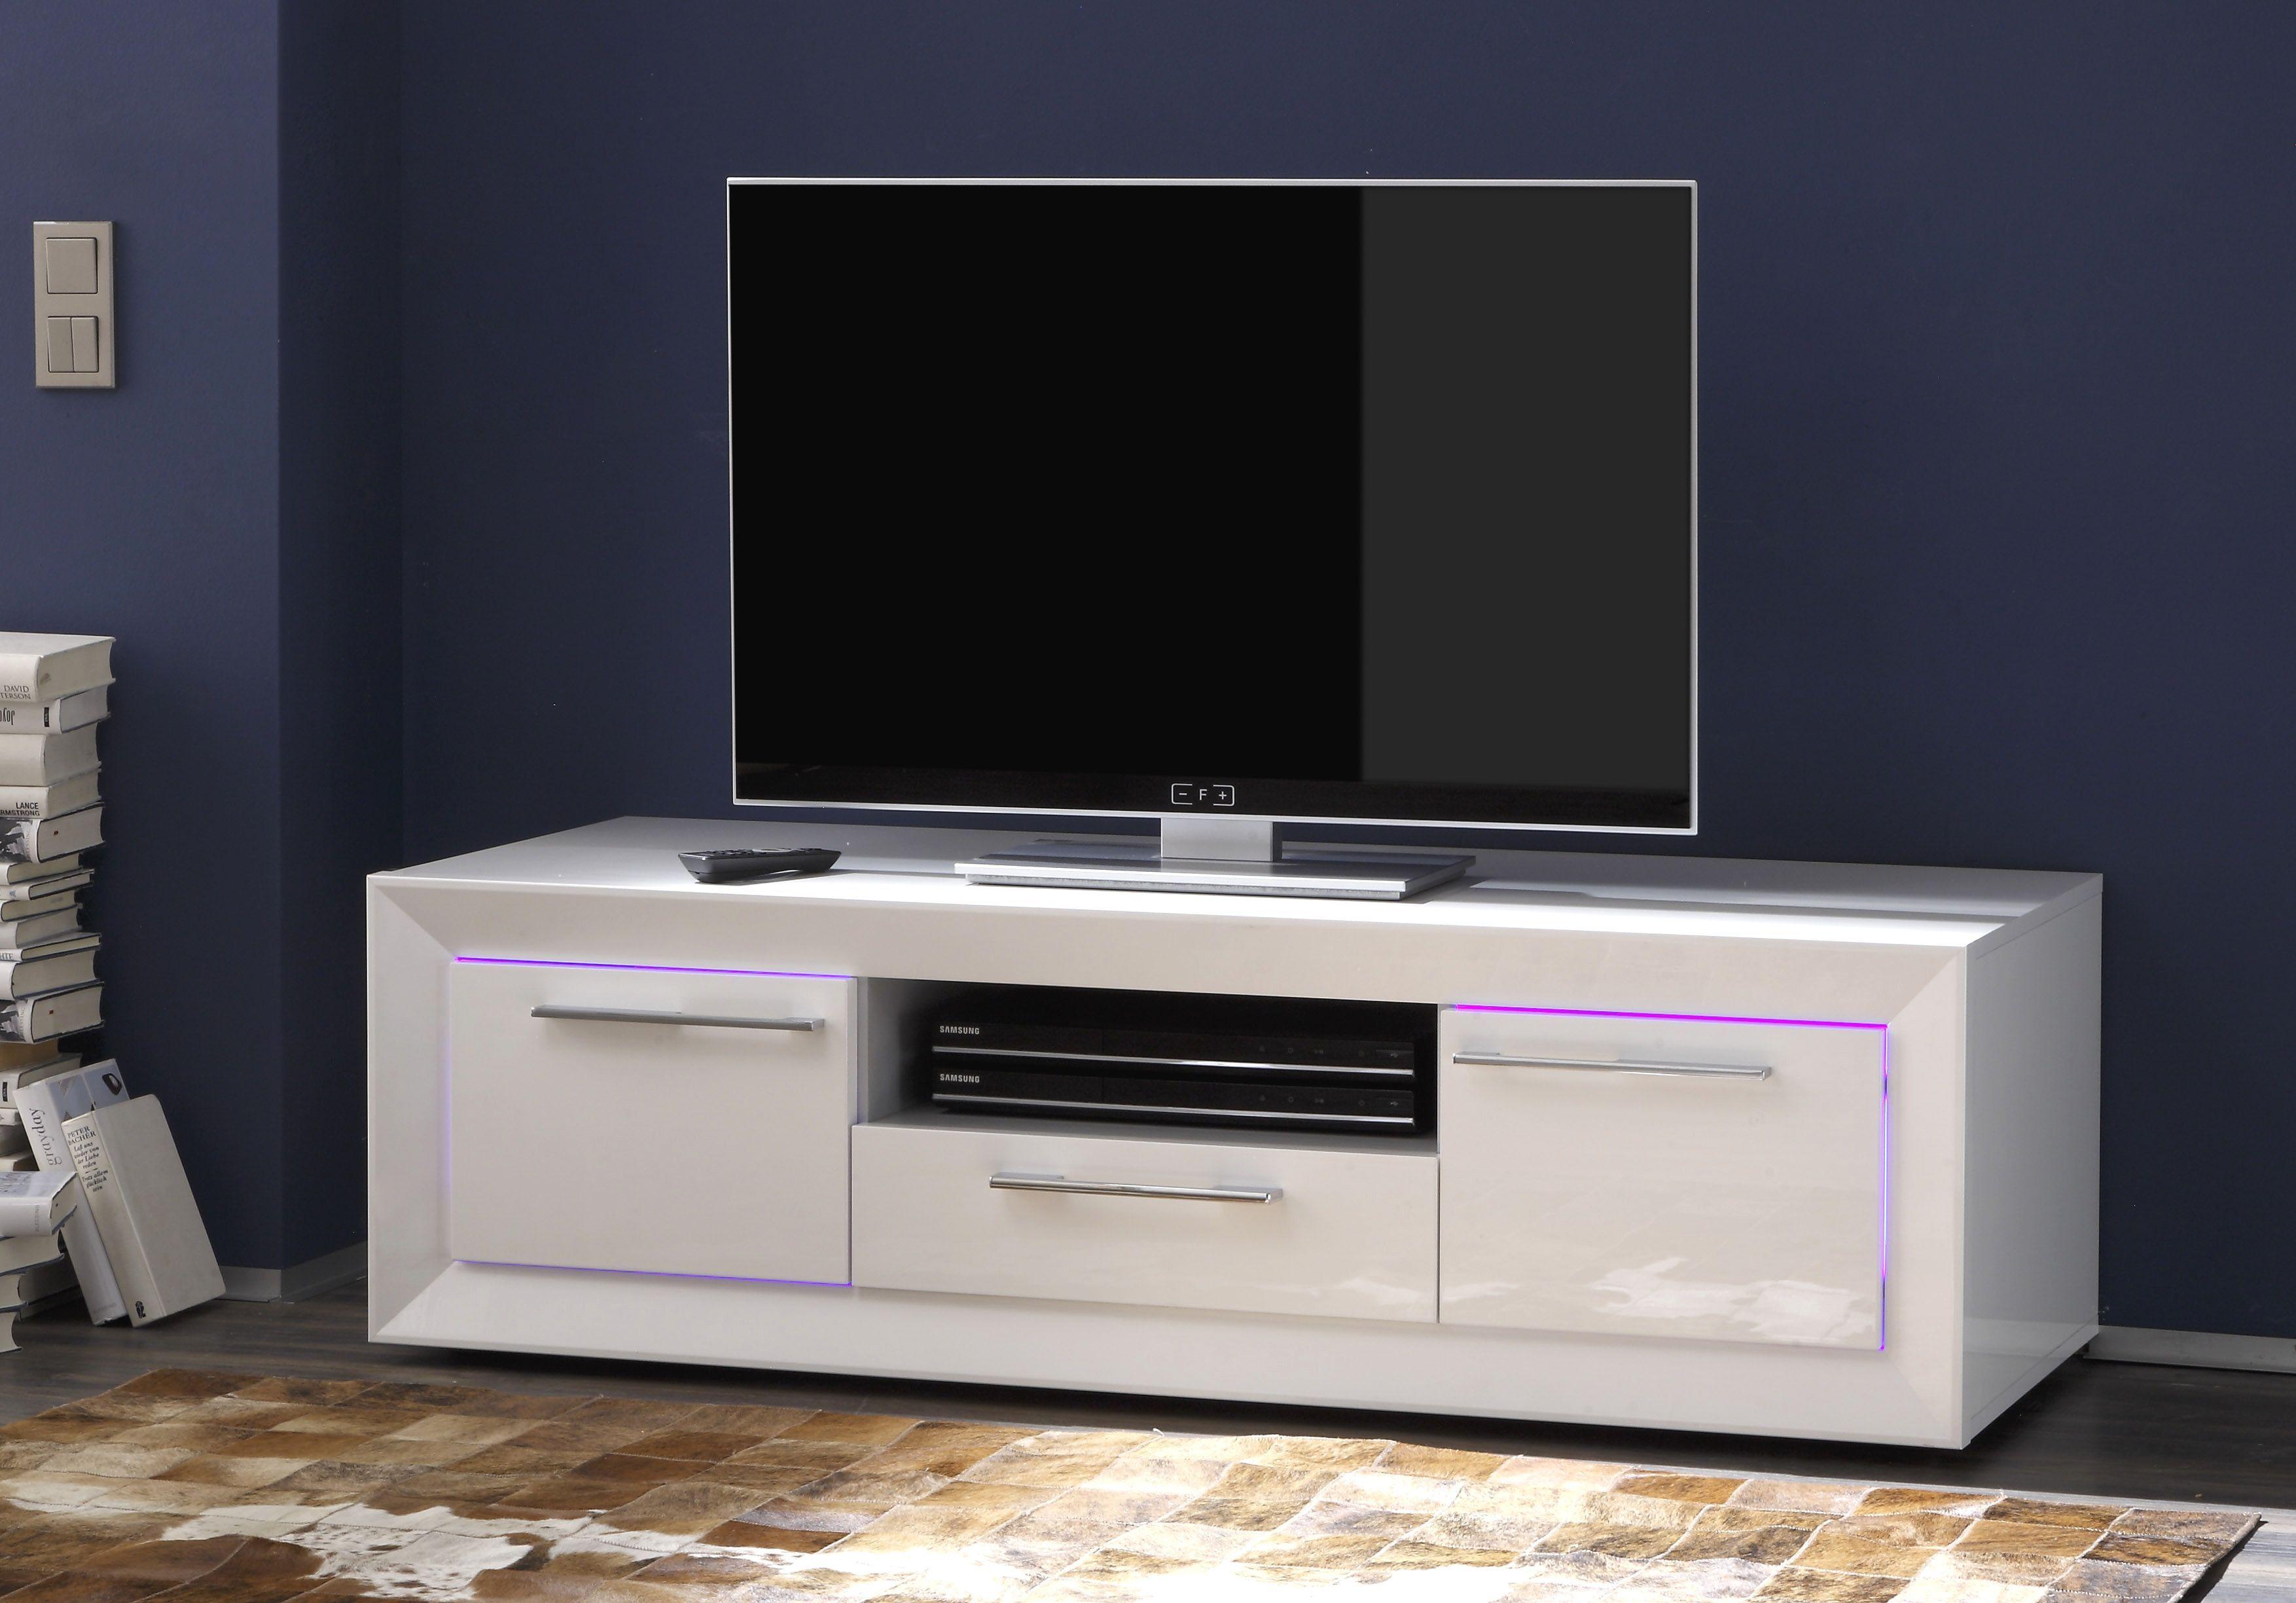 Etourdissant Meuble Tv 140 Cm Blanc Meuble Tv Design Meuble